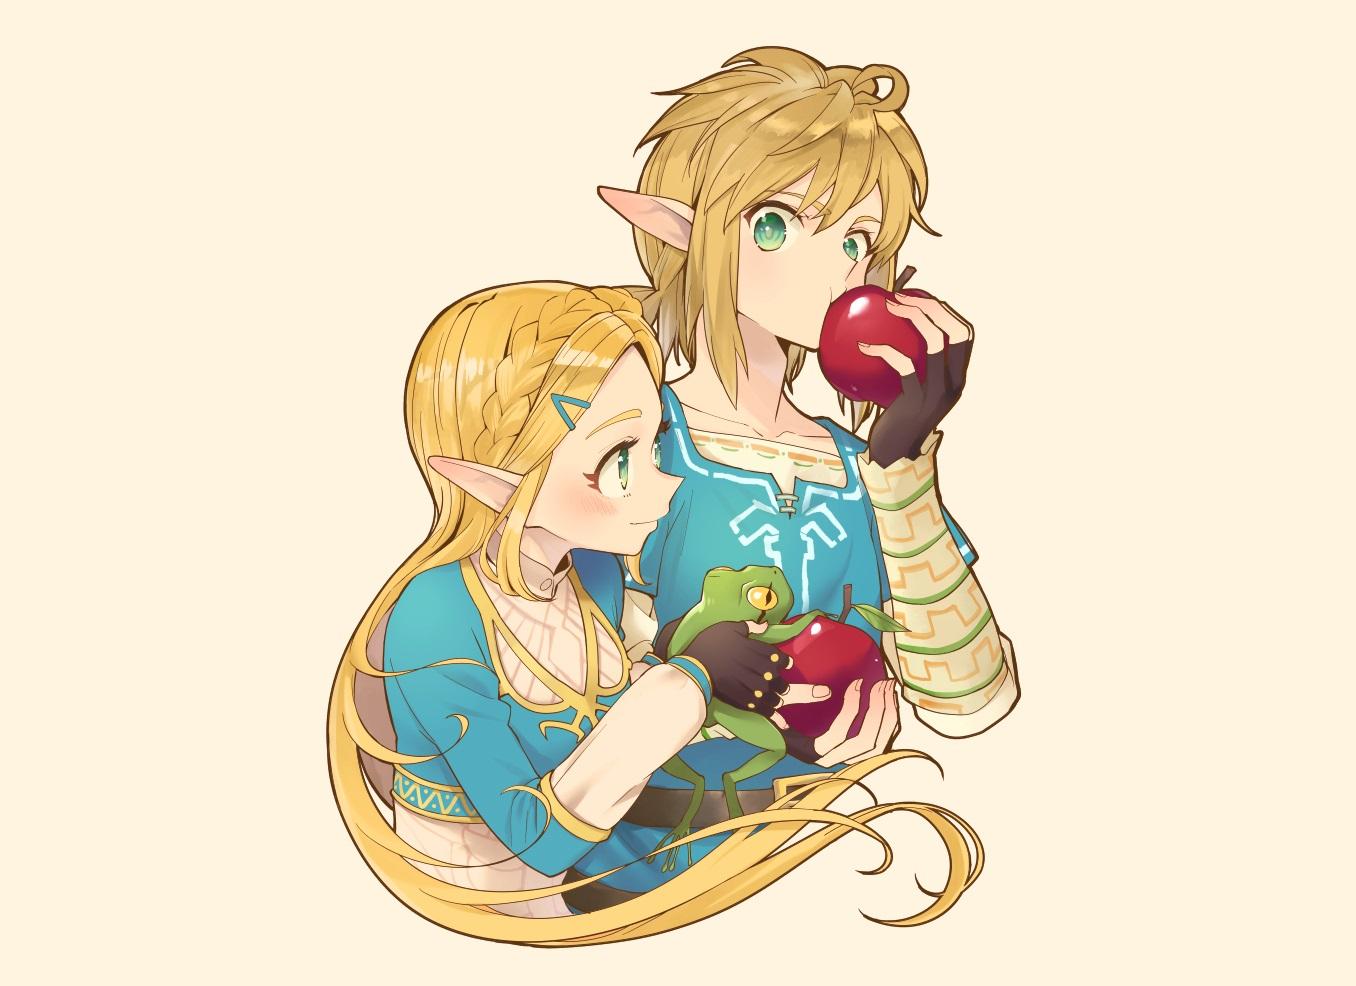 aliasing animal apple braids food frog fruit gloves green_eyes kimitoshiin link_(zelda) long_hair male pointed_ears ponytail princess_zelda short_hair the_legend_of_zelda